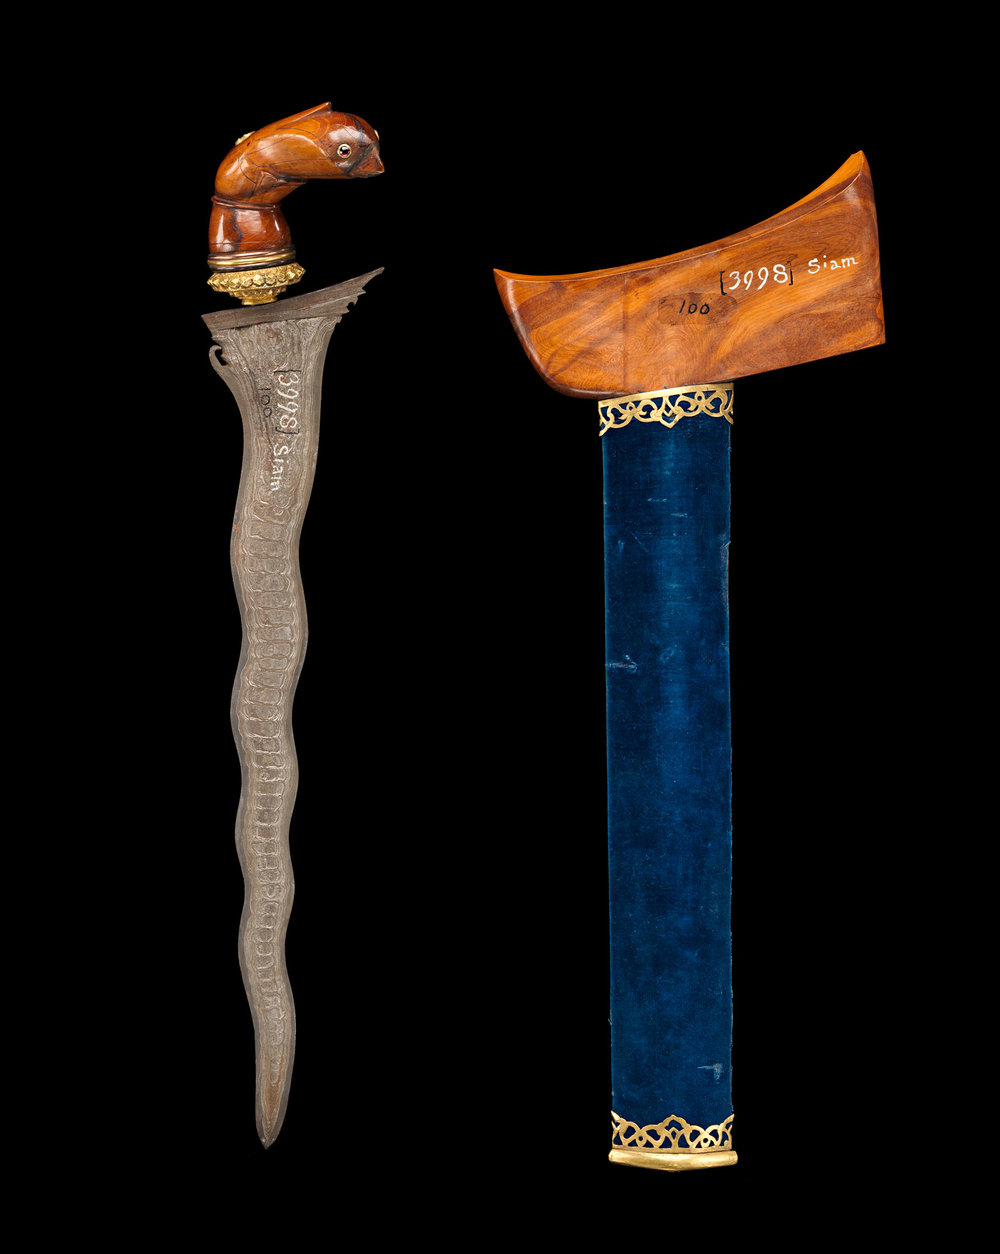 Malay-style Pamor Steel Kris and Satinwood Sheath Gift from King Mongkut to President Franklin Pierce, 1856 42.5 cm length Courtesy of the Smithsonian Institution, Department of Anthropology; E100-0; Photo by James Di Loreto, Lucia RM Martino, and Fred Cochard  กริชเหล็กไหลมลายู และฝักไม้แก้ว ของขวัญพระราชทานจากพระบาทสมเด็จพระจอมเกล้าเจ้าอยู่หัว แก่ประธานาธิบดีแฟรงกลิน เพียร์ซ พ.ศ. ๒๓๙๙ ความยาว ๔๒.๕ ซม. ได้รับความอนุเคราะห์จากฝ่ายมานุษยวิทยา สถาบันสมิธโซเนียน; E100-0; ถ่ายโดยเจมส์ ดิลอเรโต ลูเซีย อาร์เอ็ม มาร์ติโน และเฟร็ด โชชาร์ด